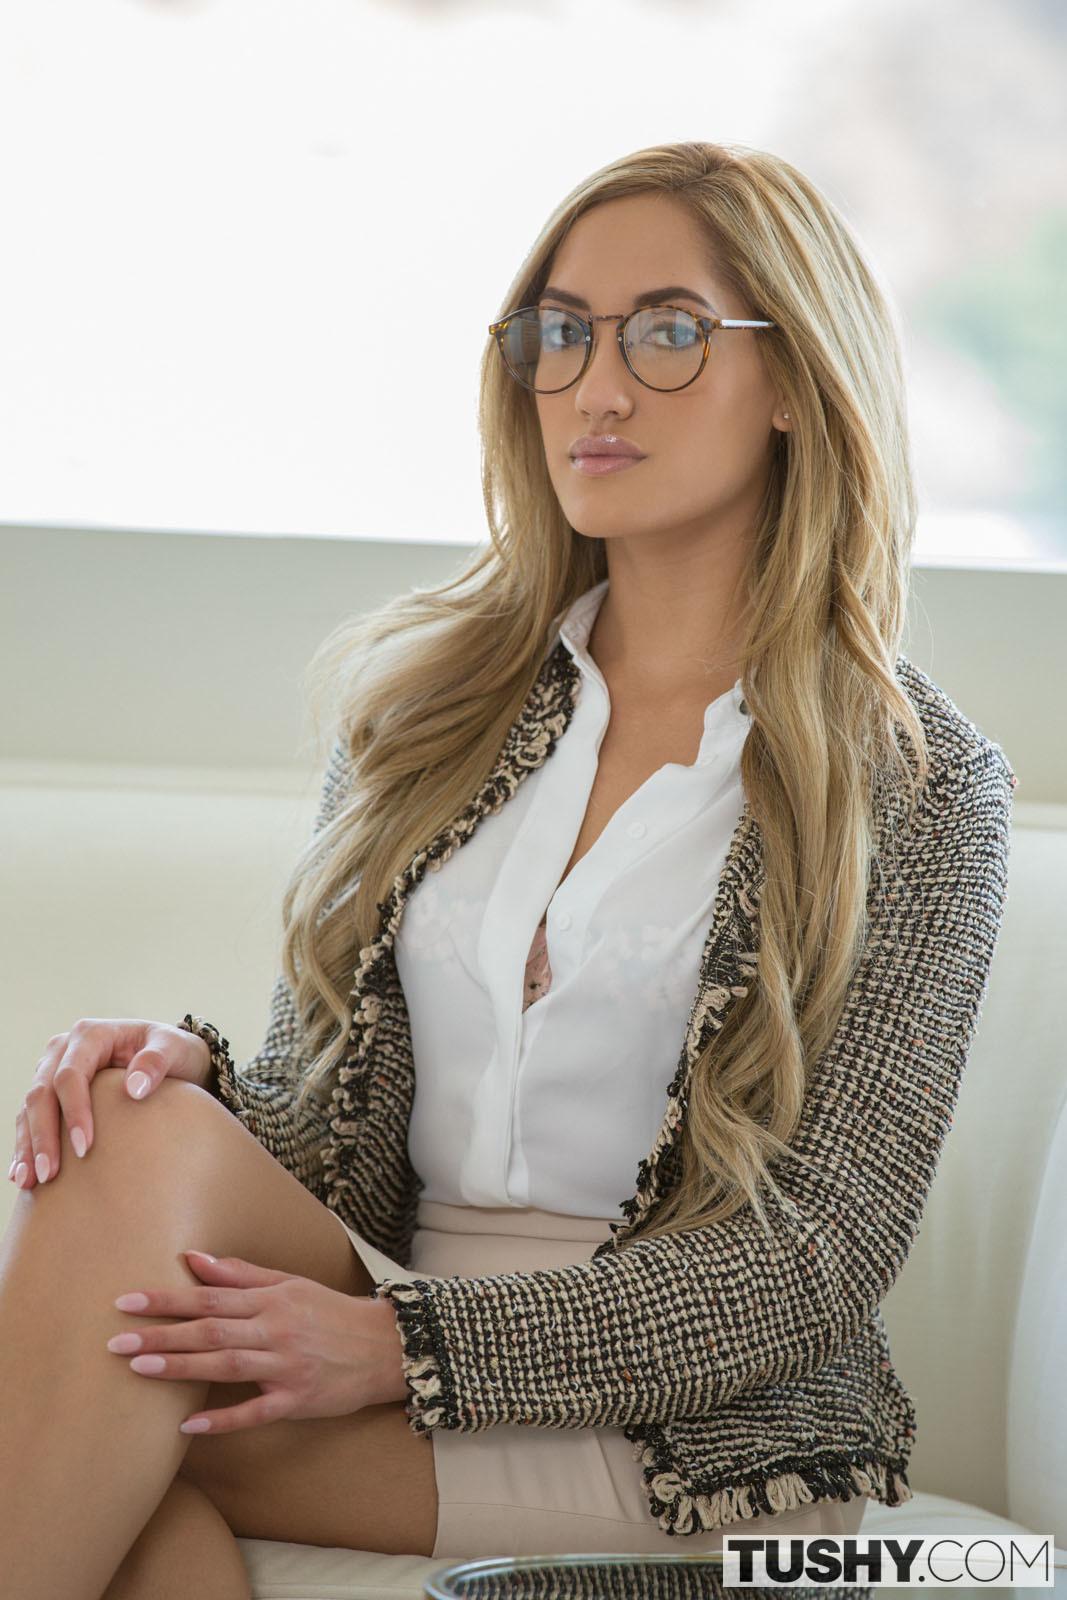 Chloe Amour Double Penetration - free porn ...